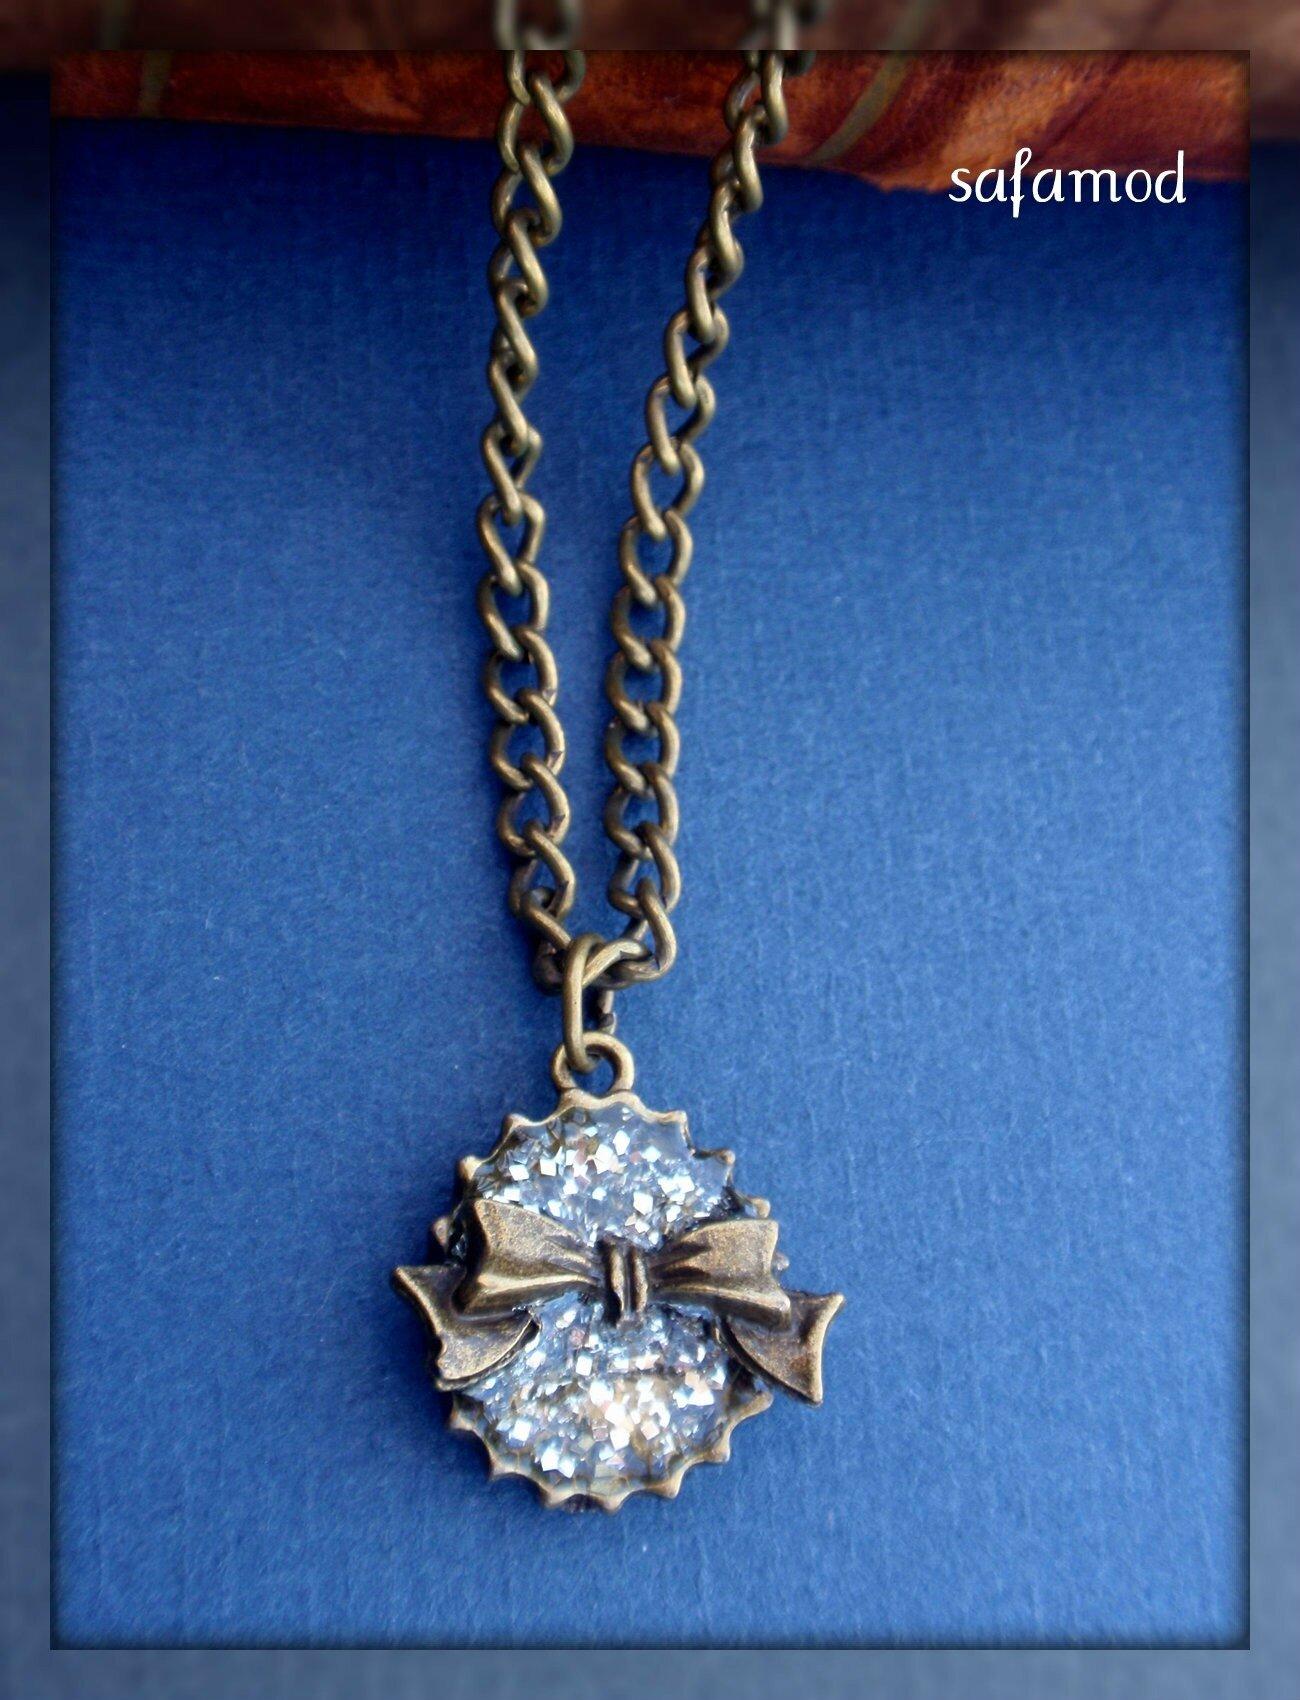 collier-collier-pendentif-capsule-resine-a-3440491-p4020339-ec4a3_big